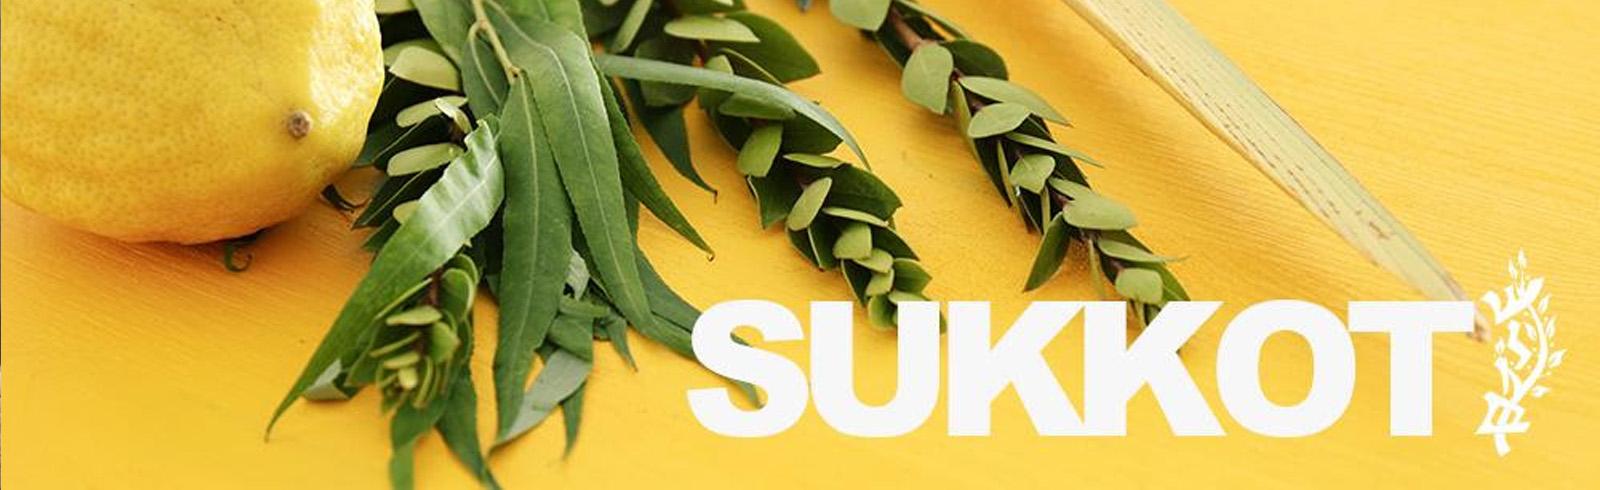 sukkot-homepage